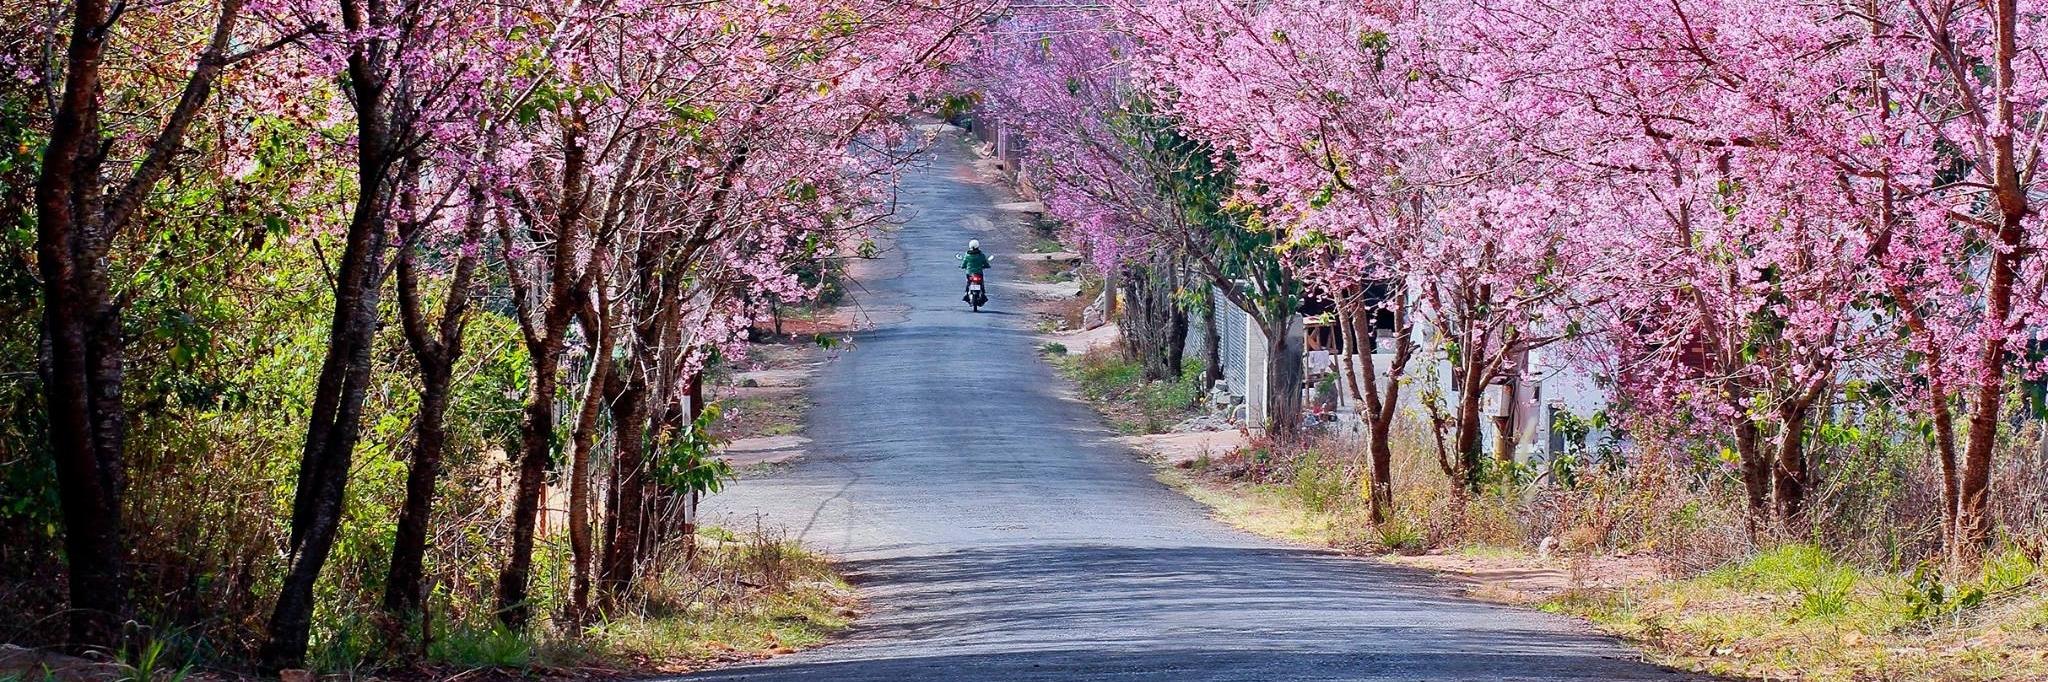 http://gody.vn/blog/tramanh.trieu6230/post/15-diem-tham-quan-noi-tieng-nhat-tai-da-lat-698